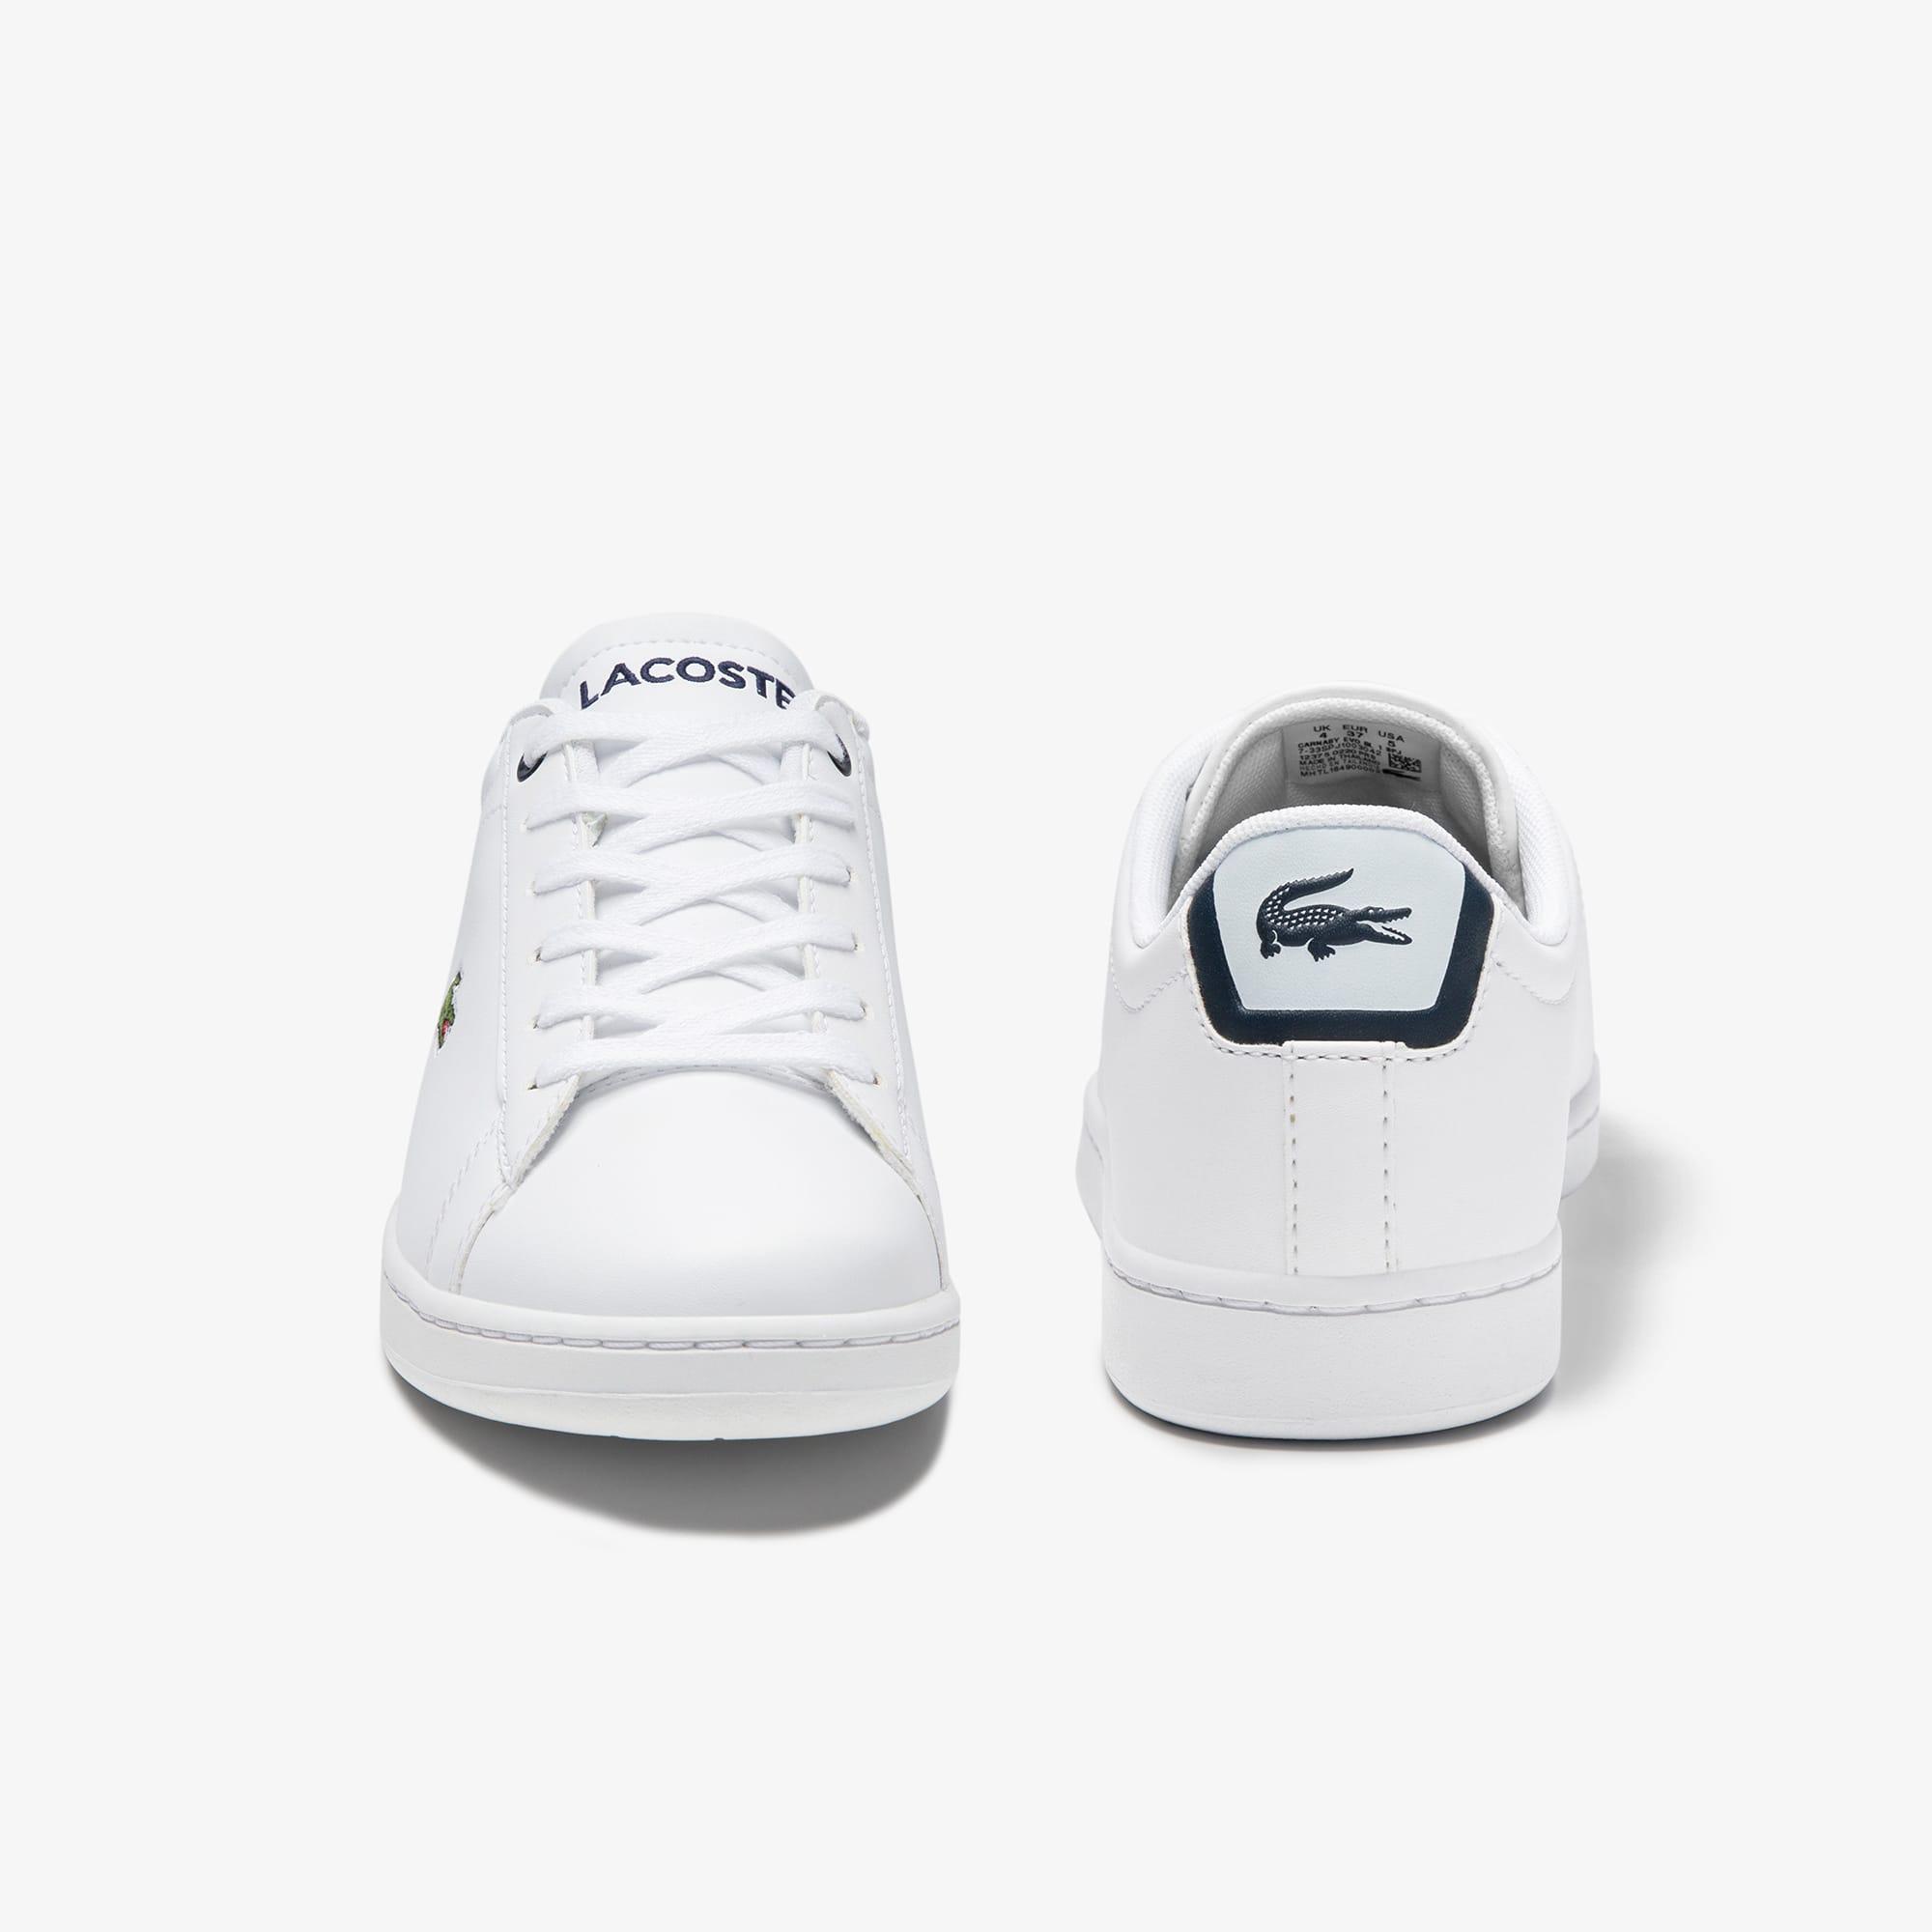 051e1b8e6 Sneakers Carnaby Evo Bl 1